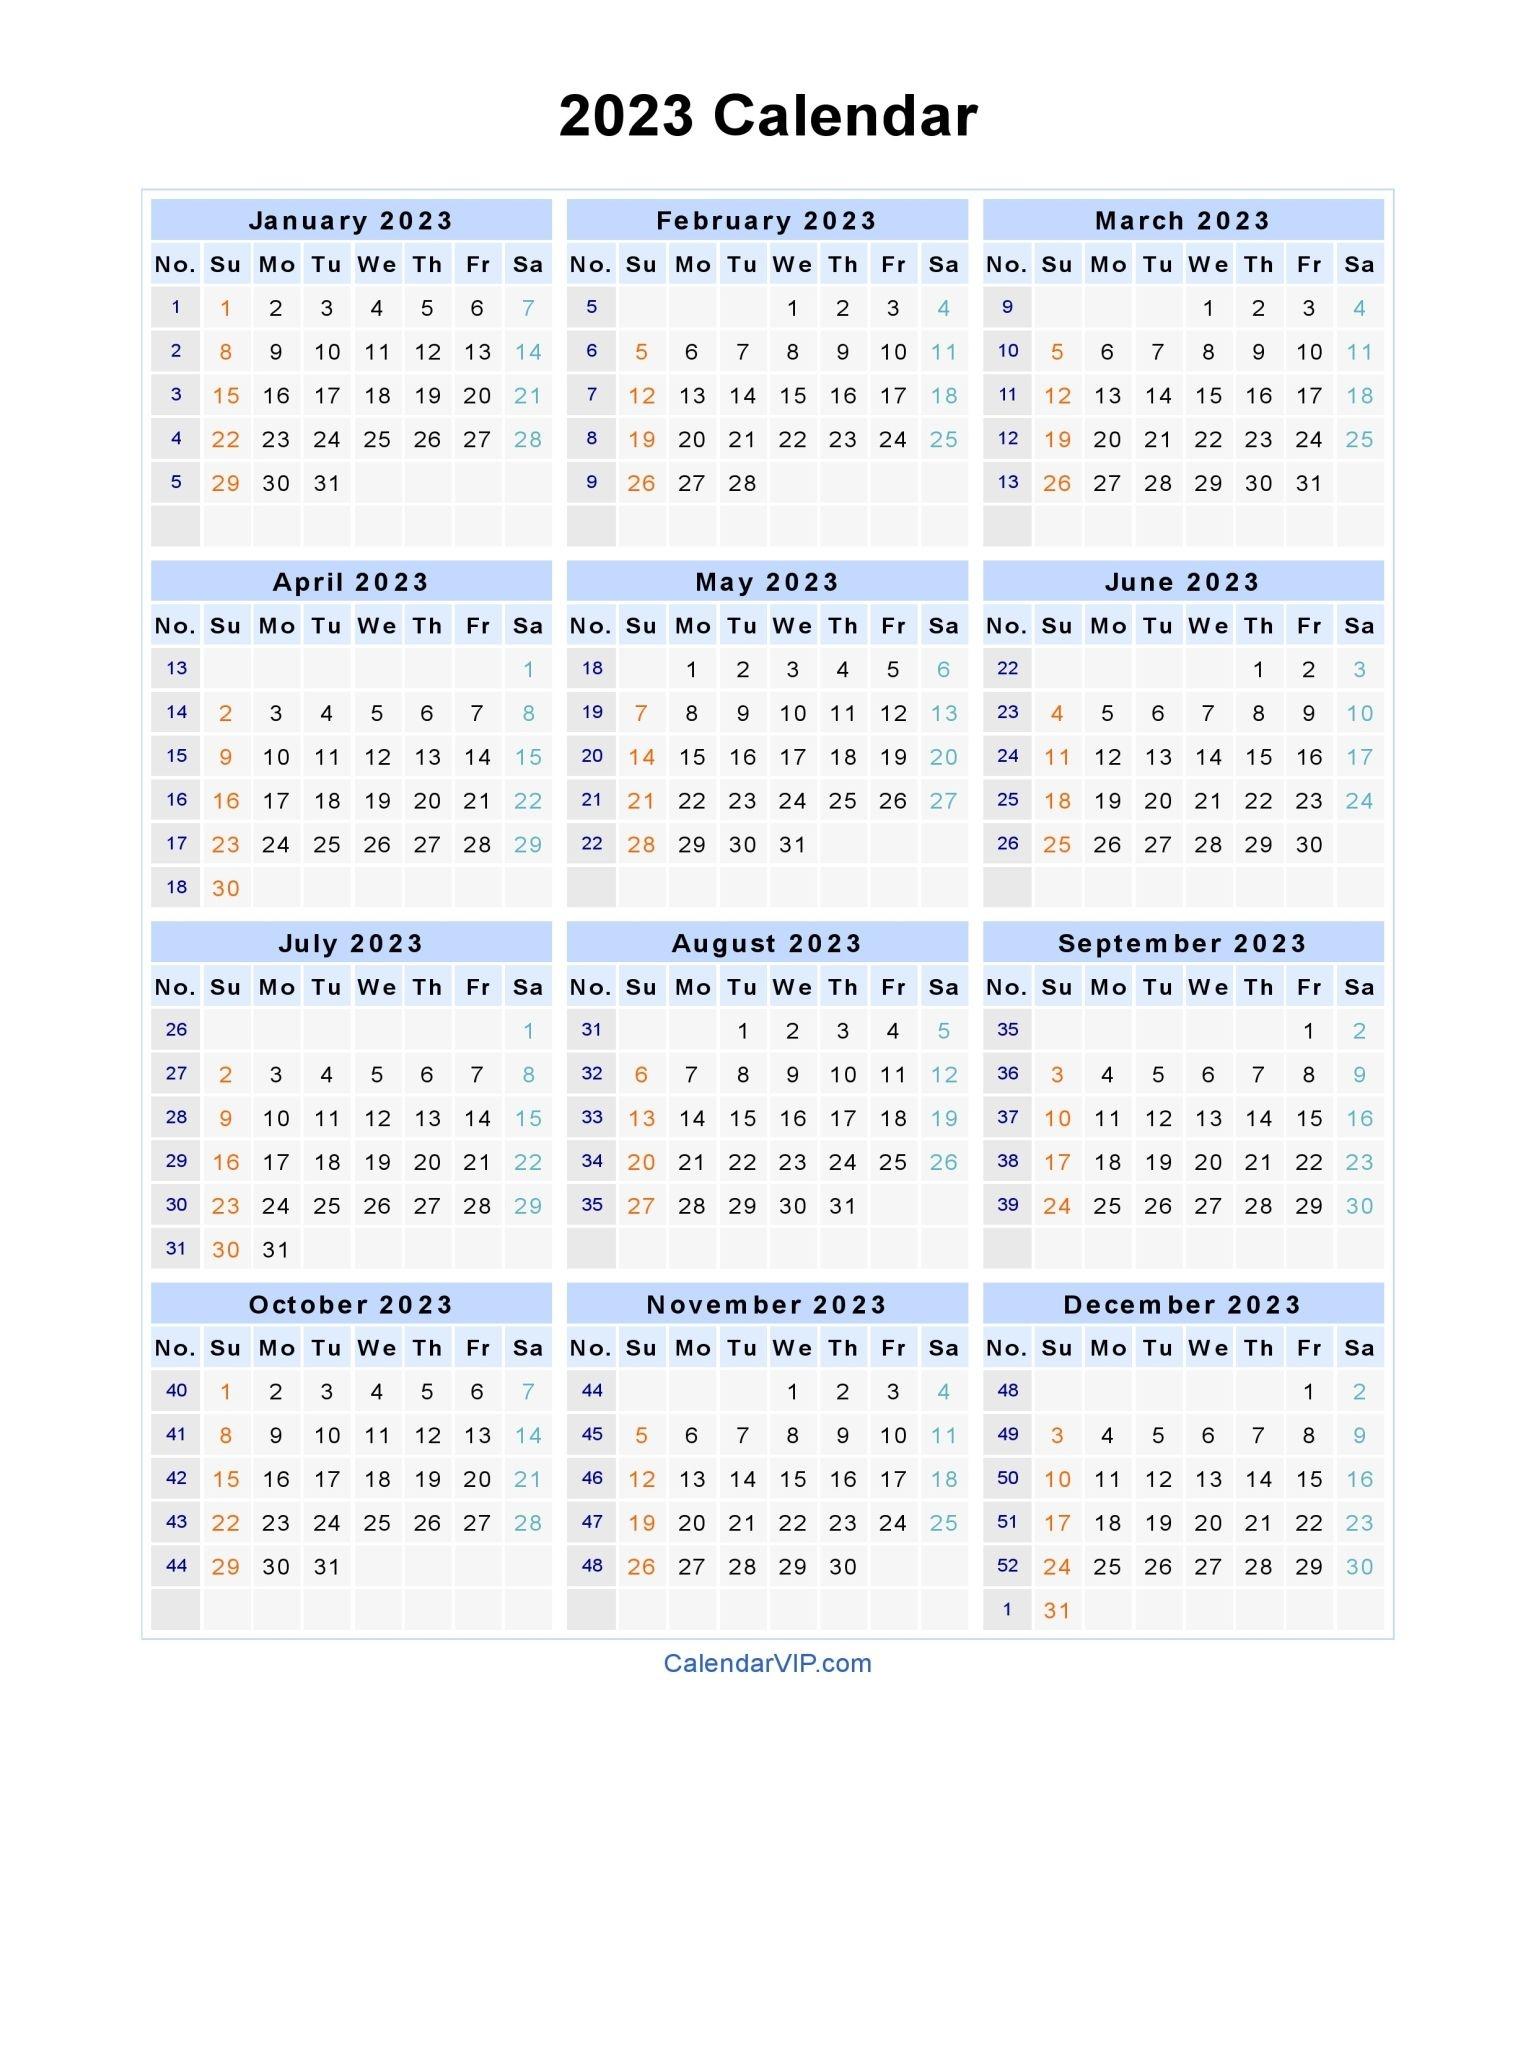 2023 Calendar - Blank Printable Calendar Template In Pdf